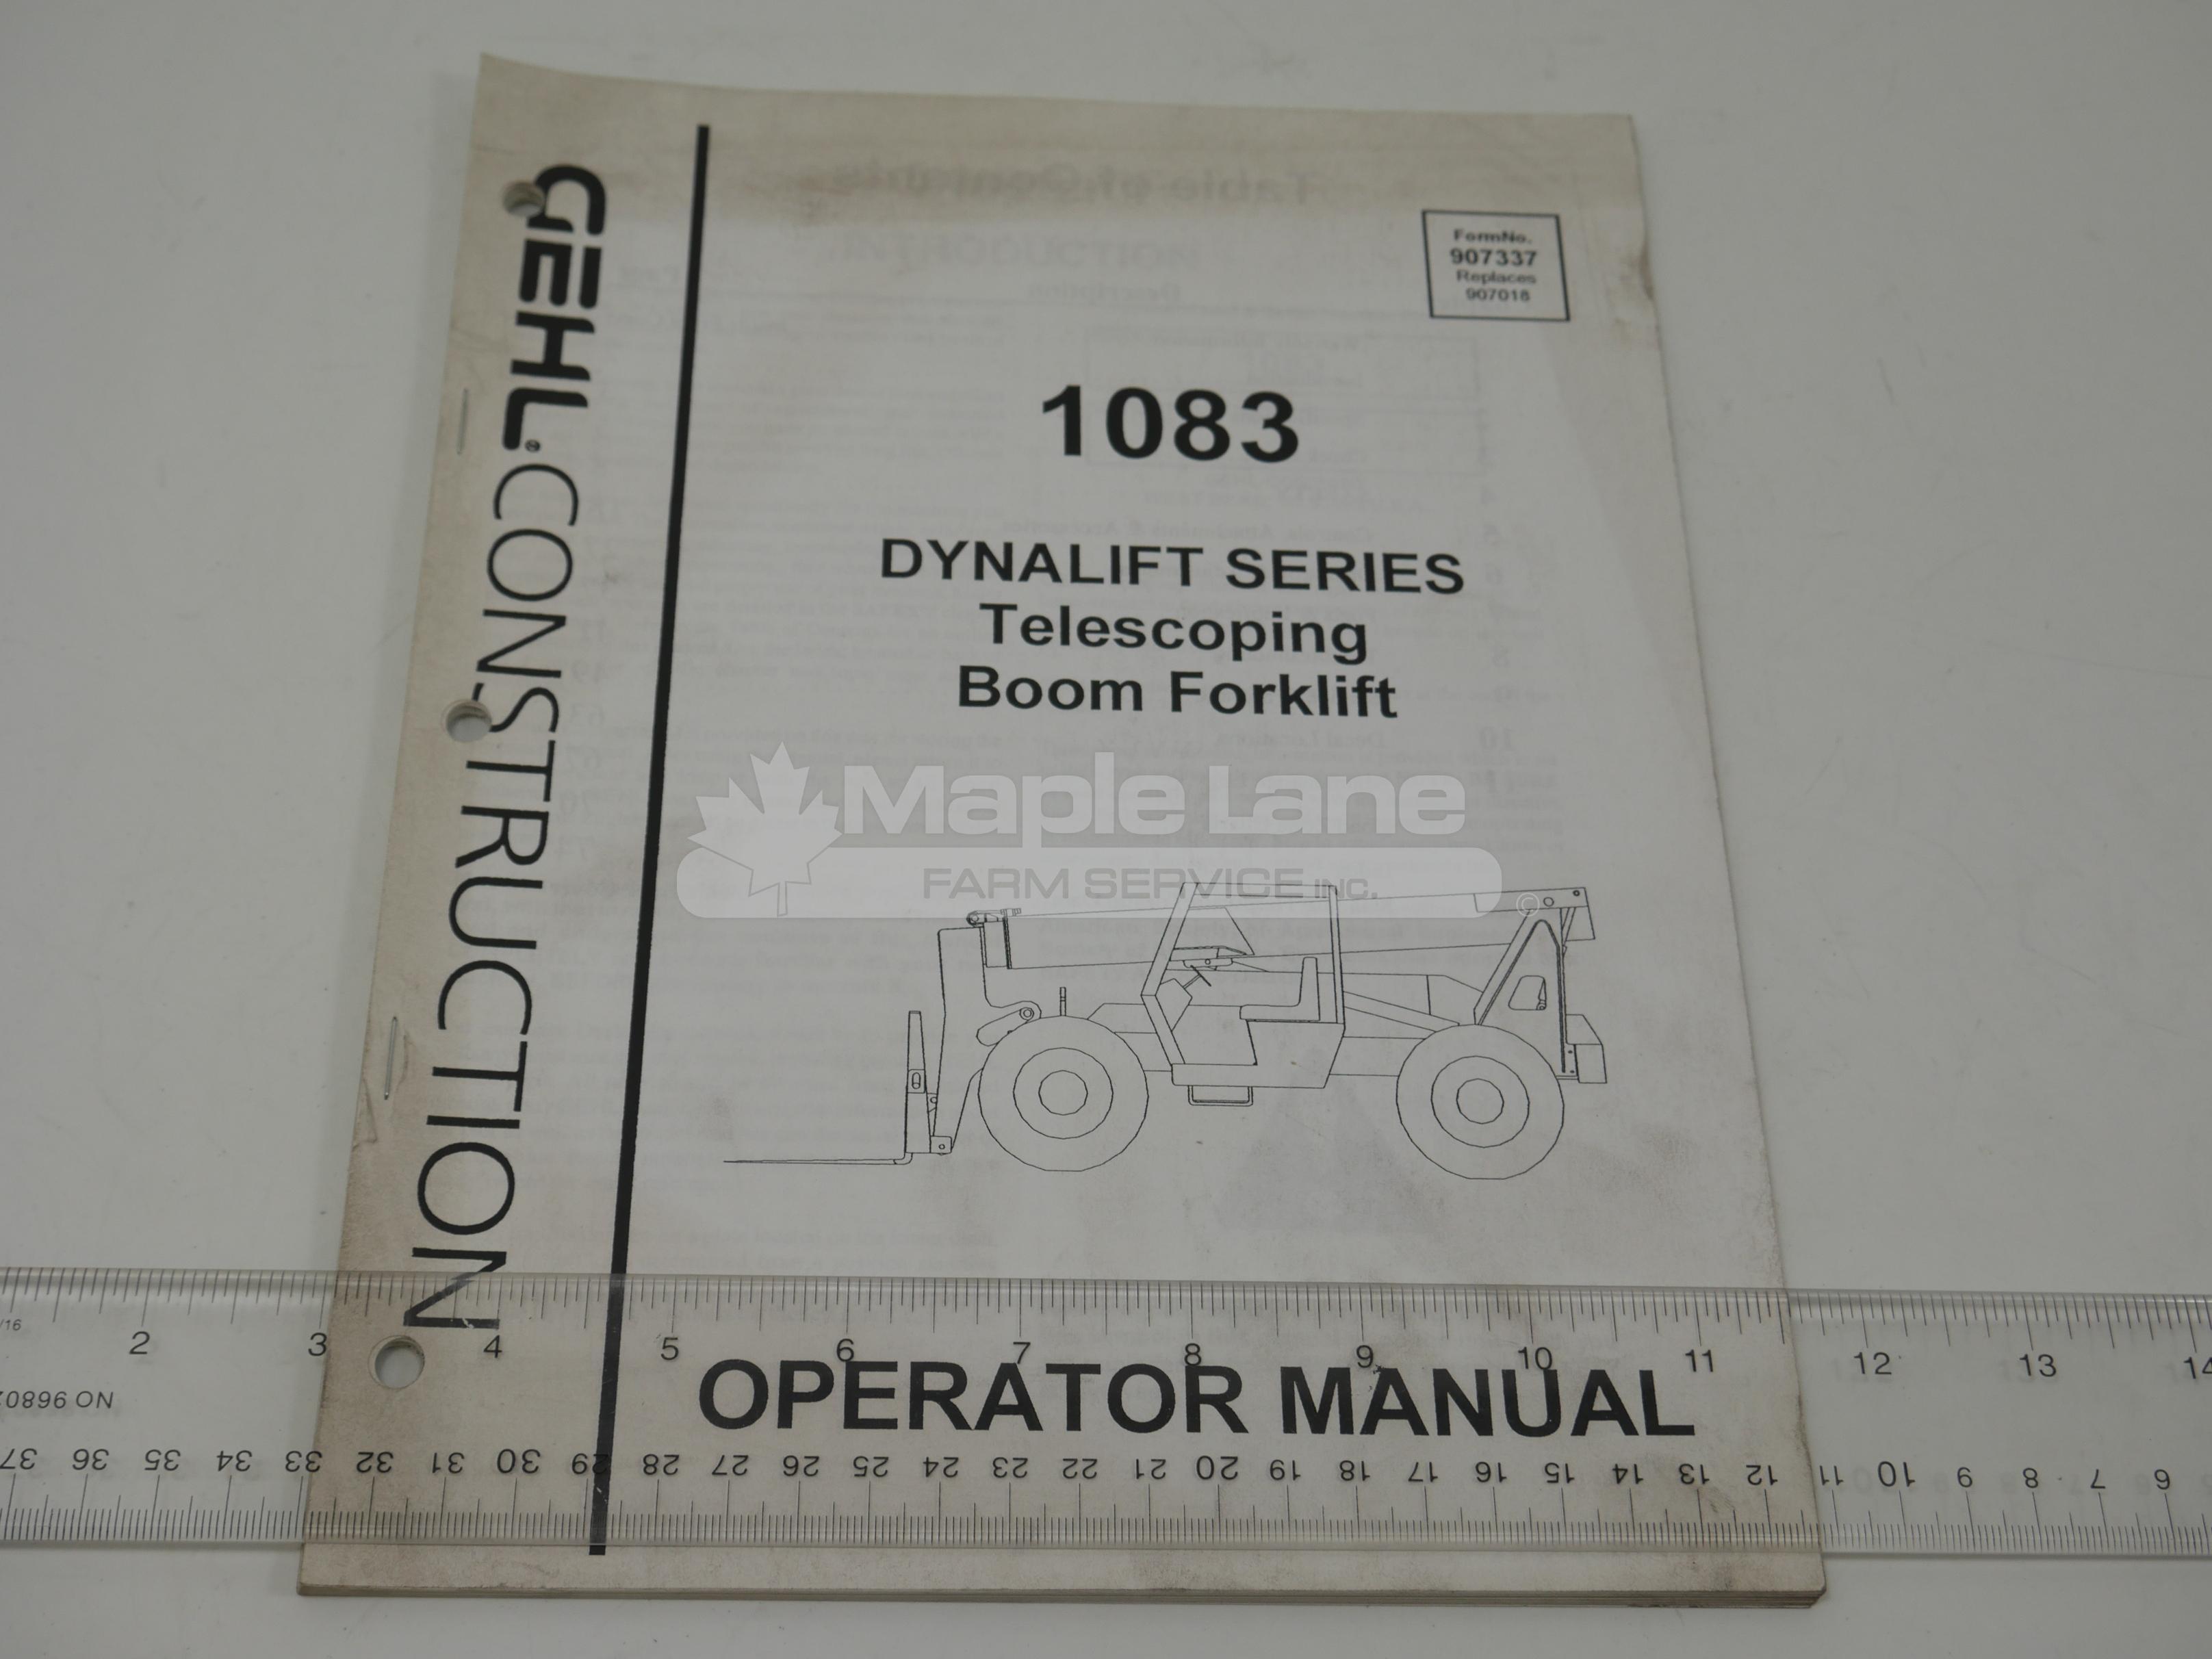 907337 Operator Manual